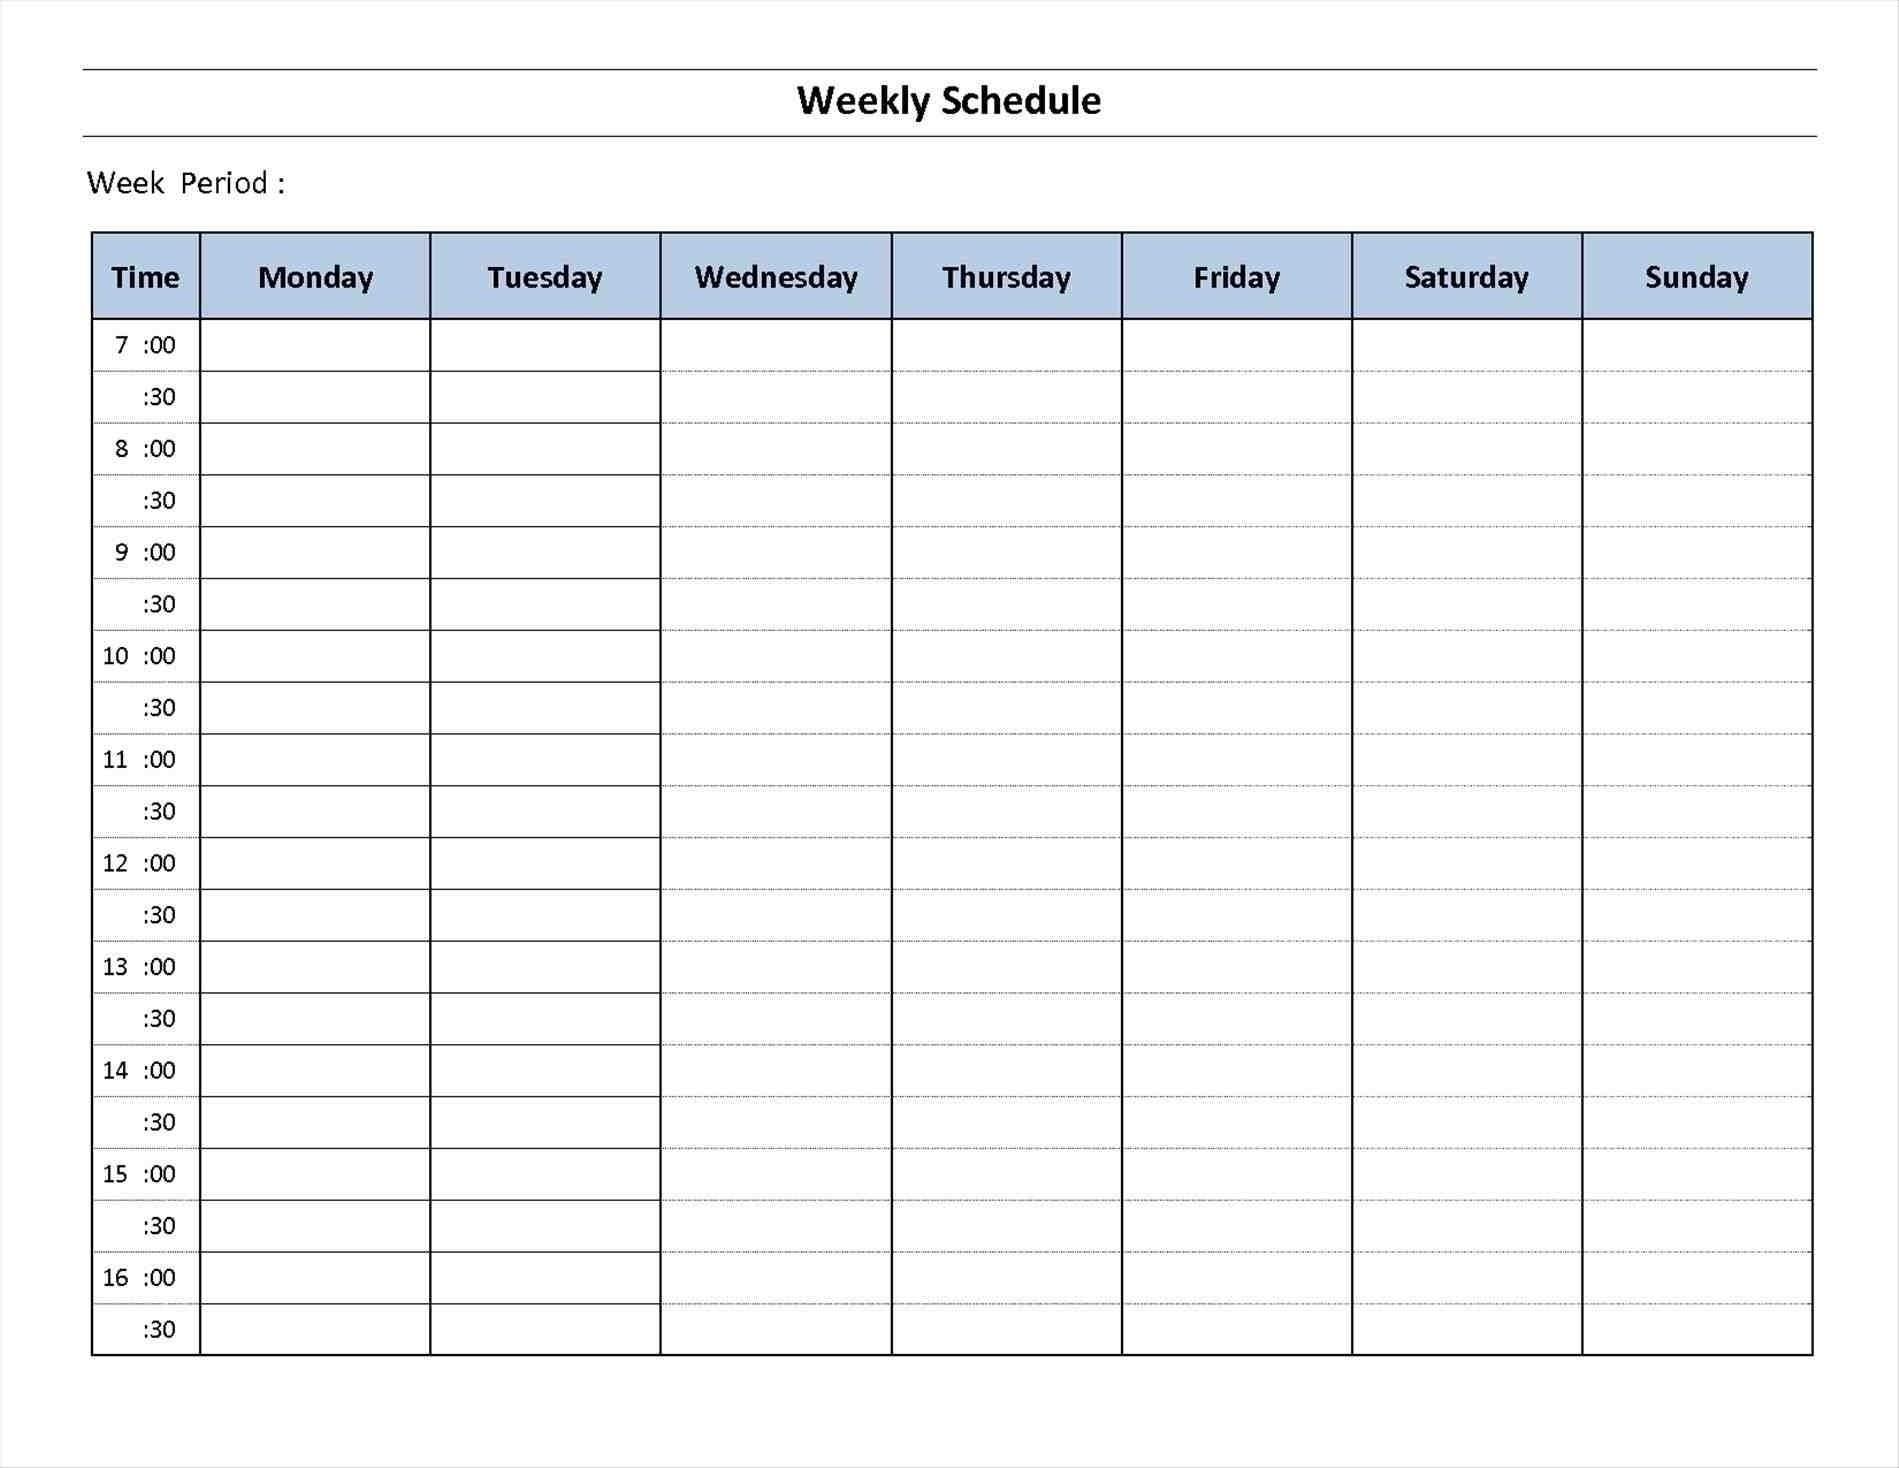 Week Calendar Template Printable Weekly Calendars Schedule | Smorad for 7 Day Calendar Template Fillable